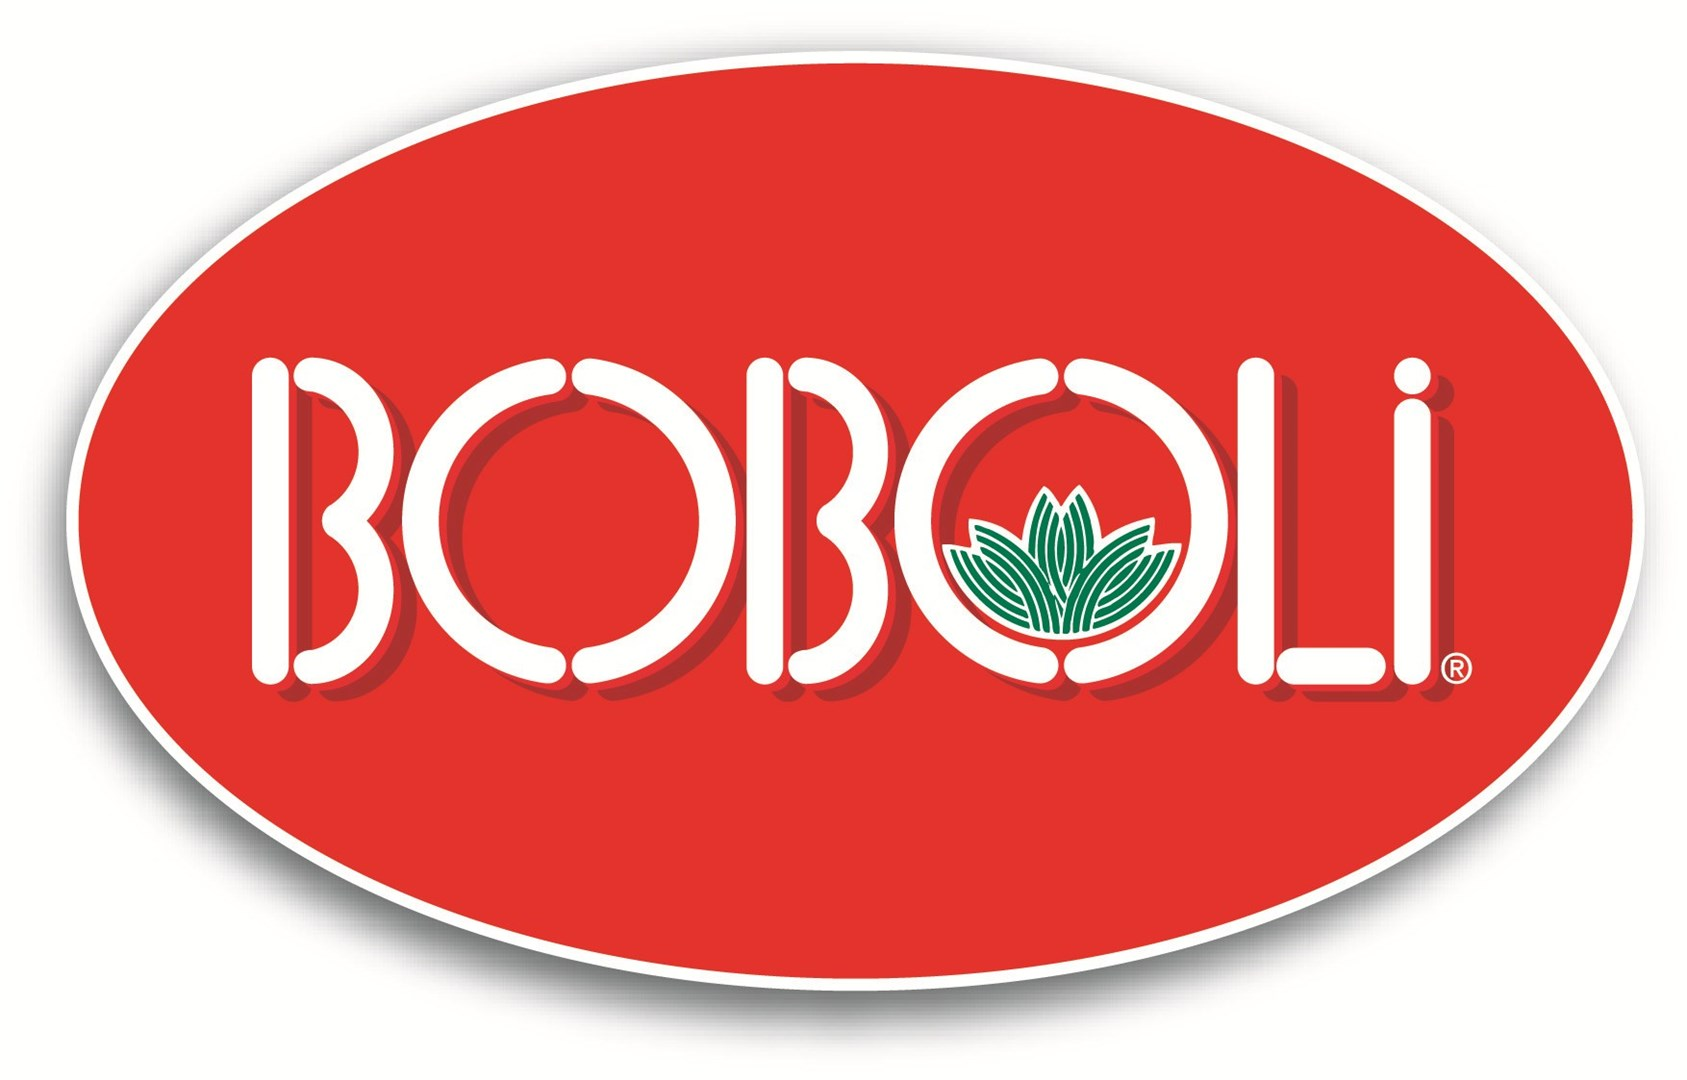 Merkafbeelding Boboli